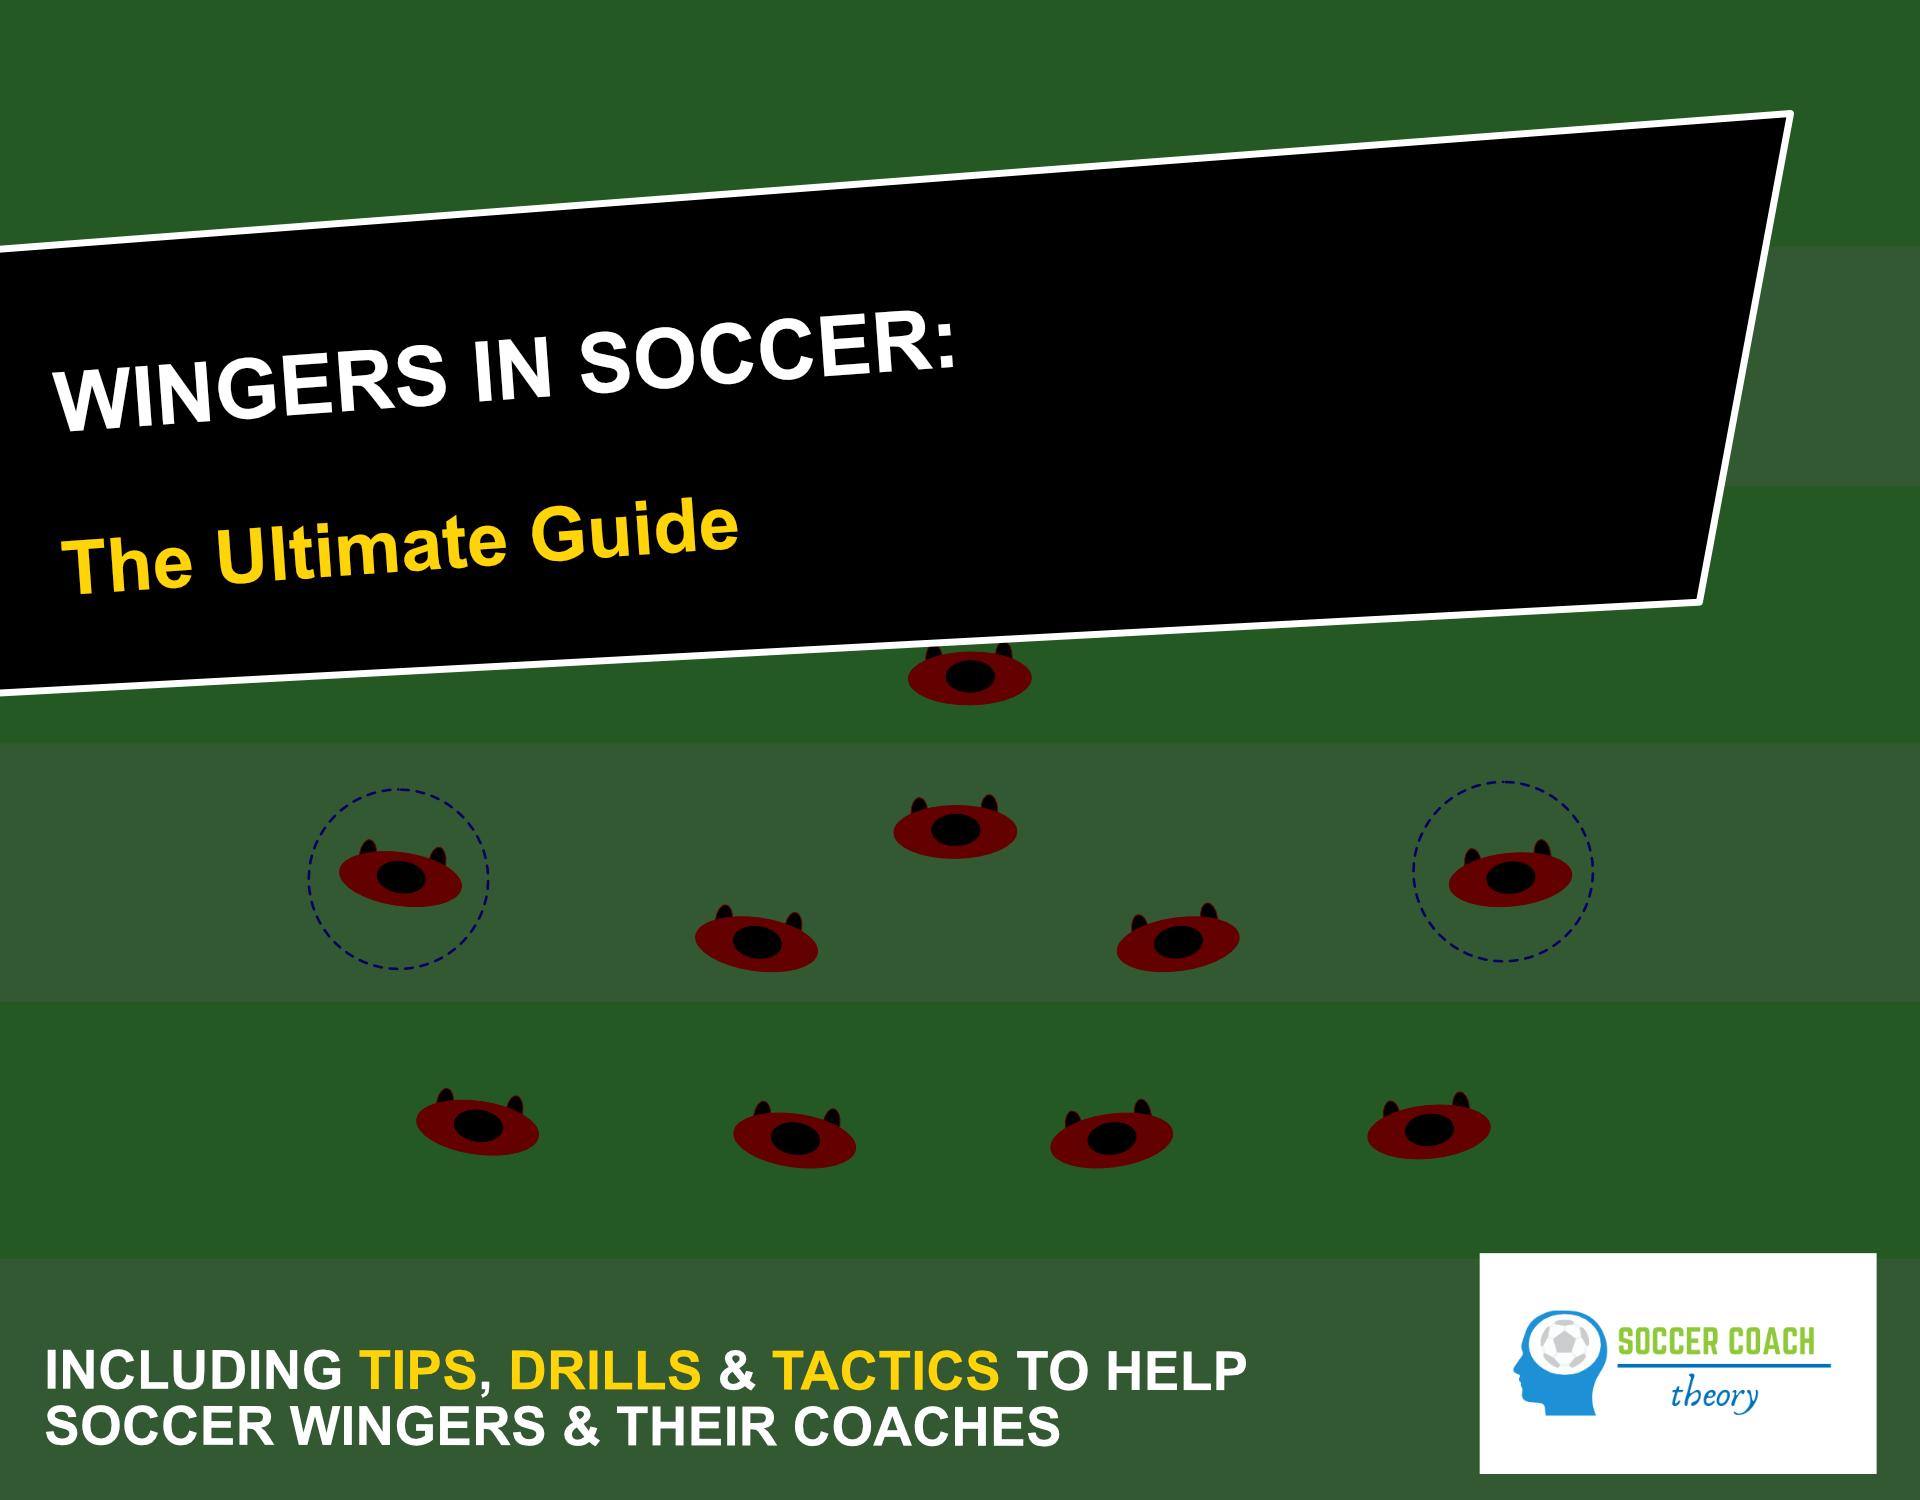 Wingers in soccer